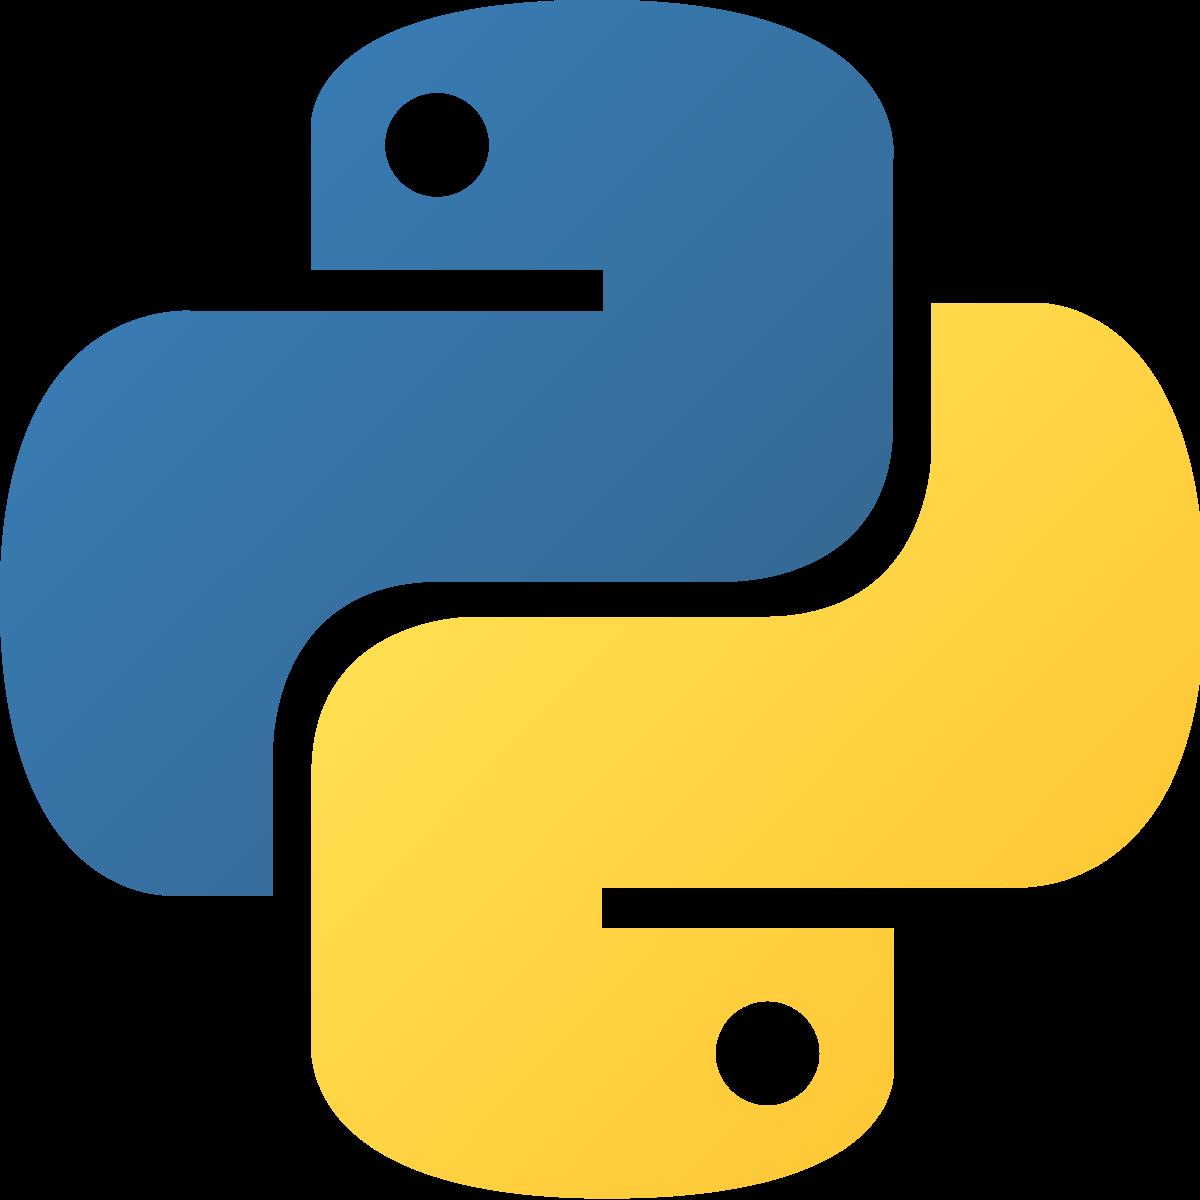 Logo of the Language Python.